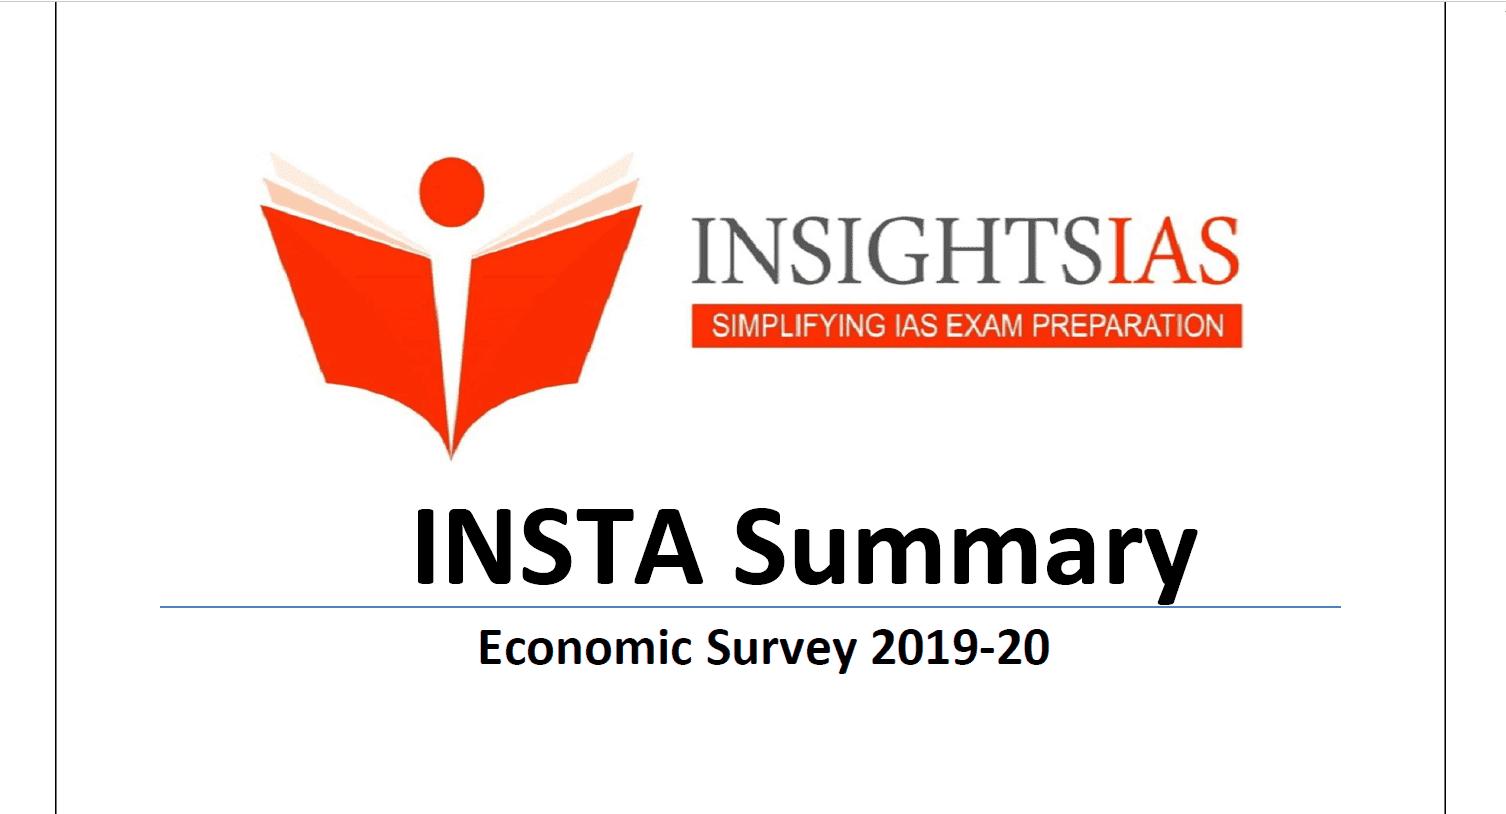 Insight IAS Economic Survey 2019-20